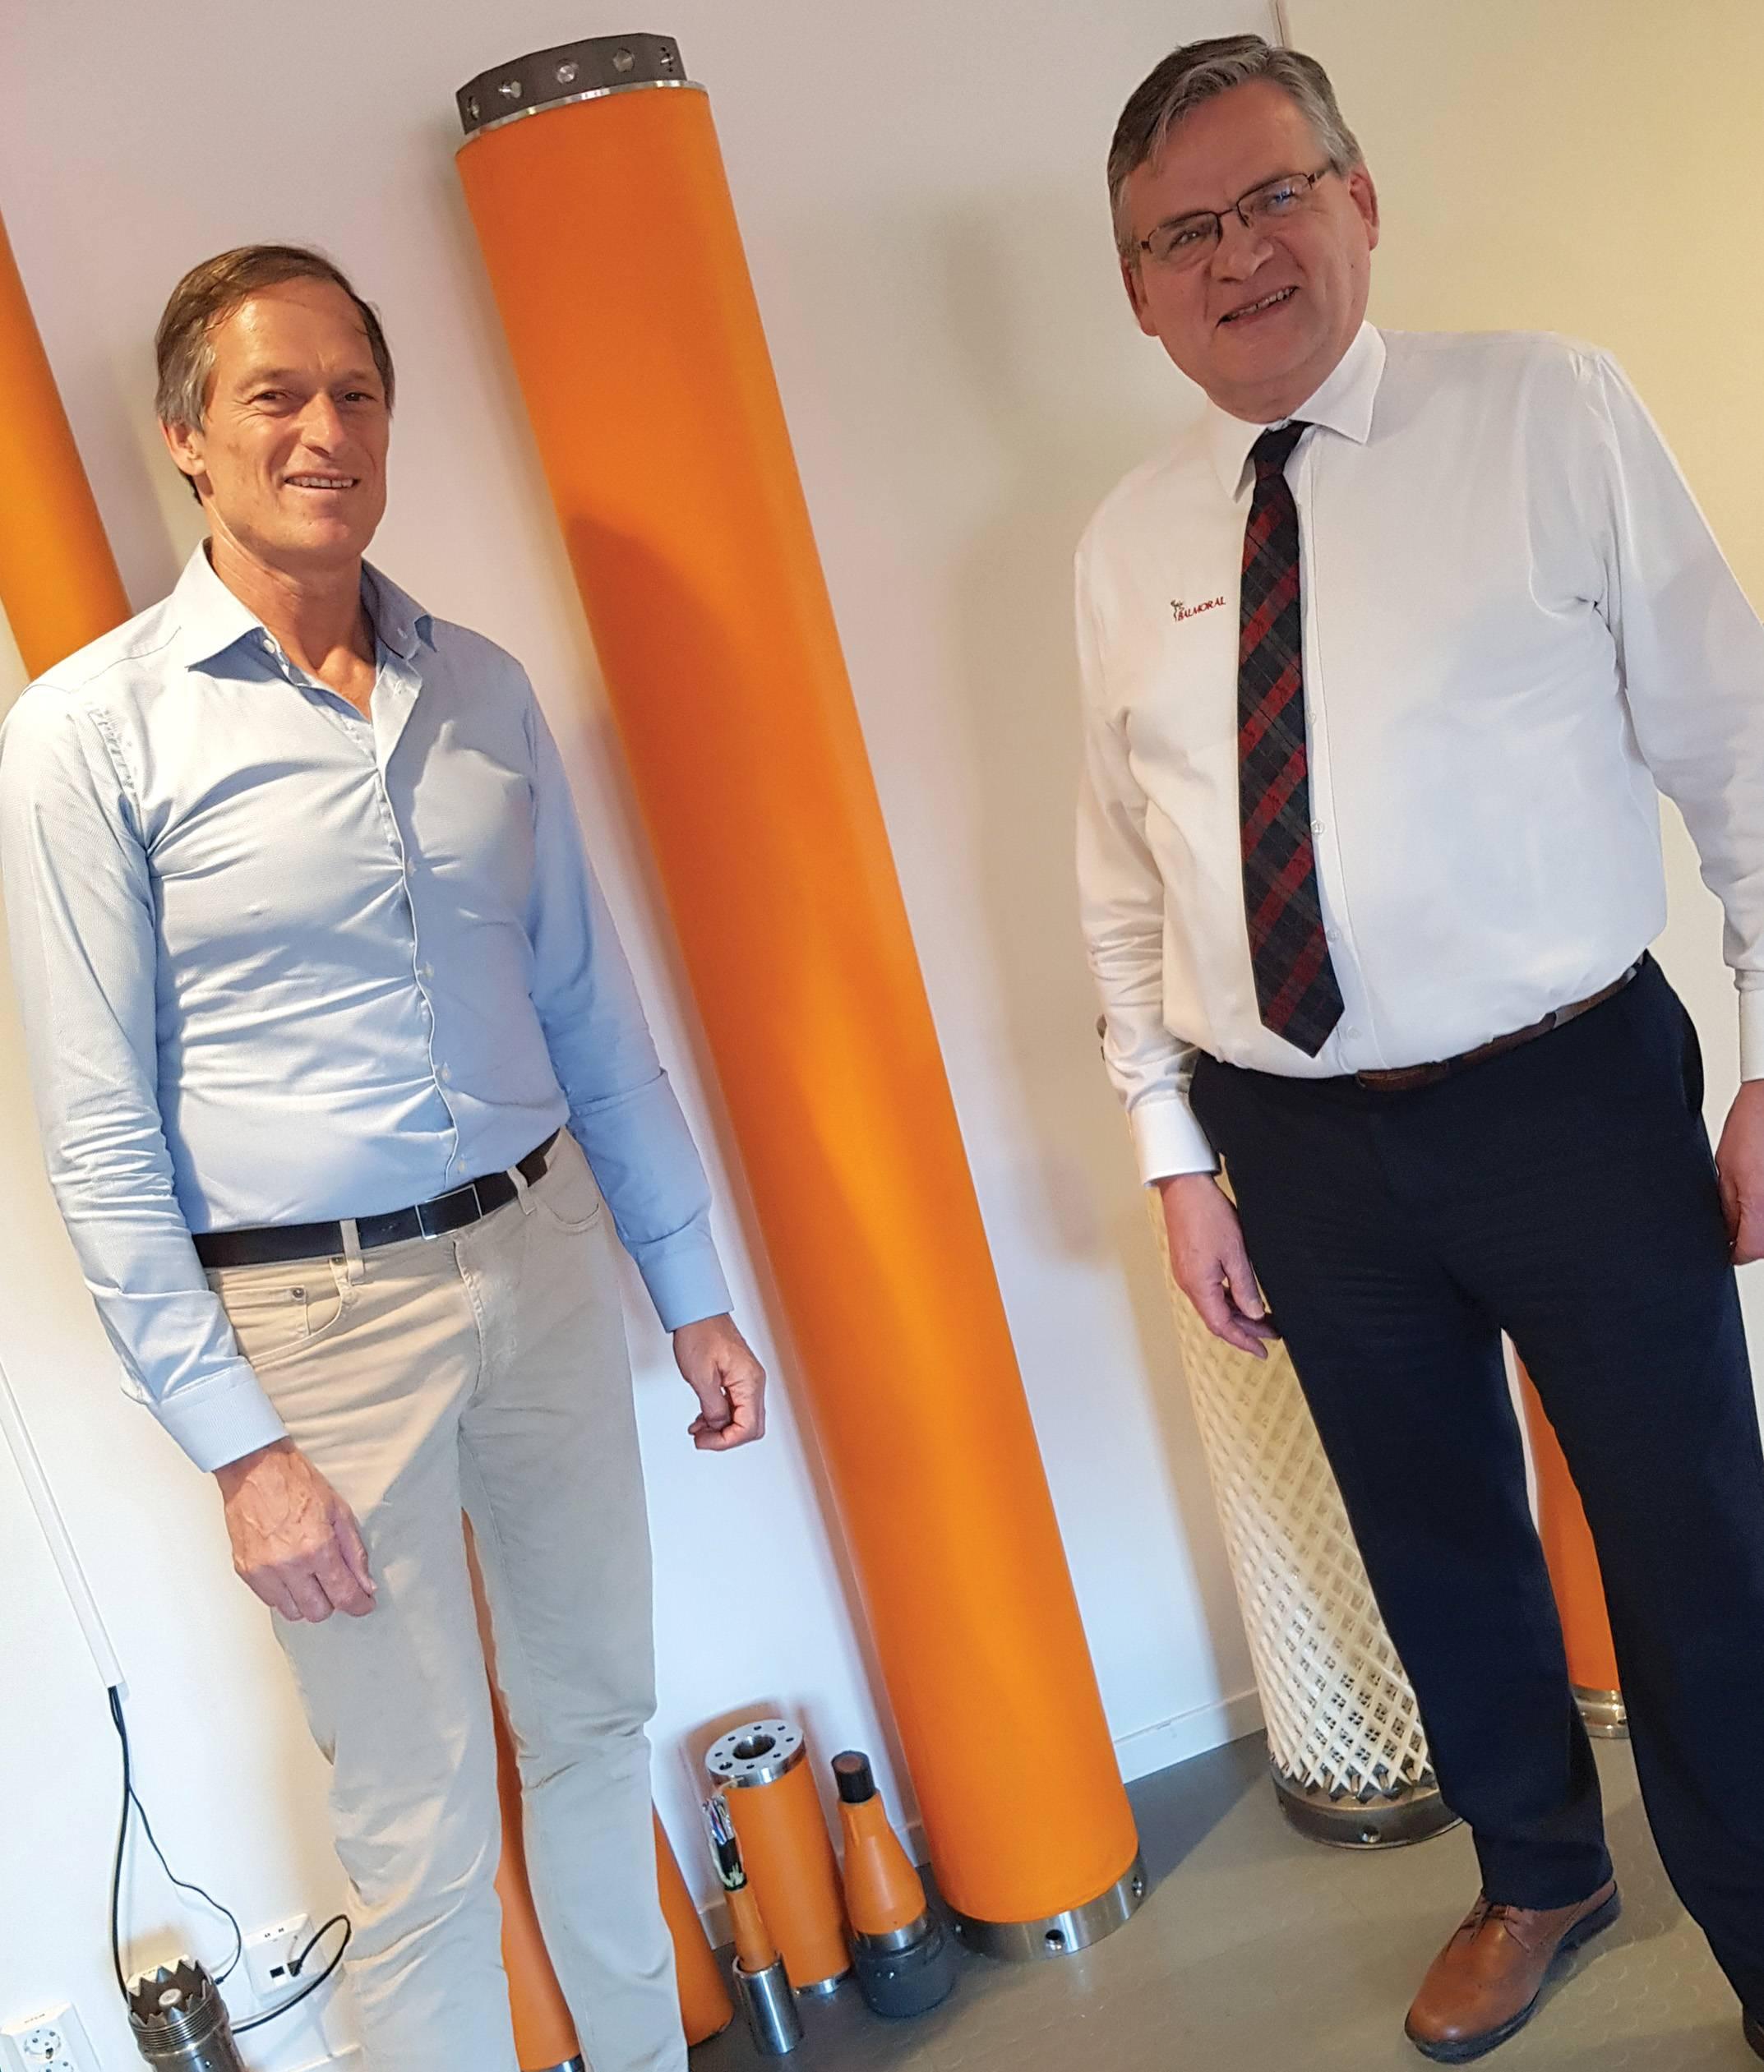 Henrik Andreasen and Bill Main (Photo: Balmoral Offshore Engineering)